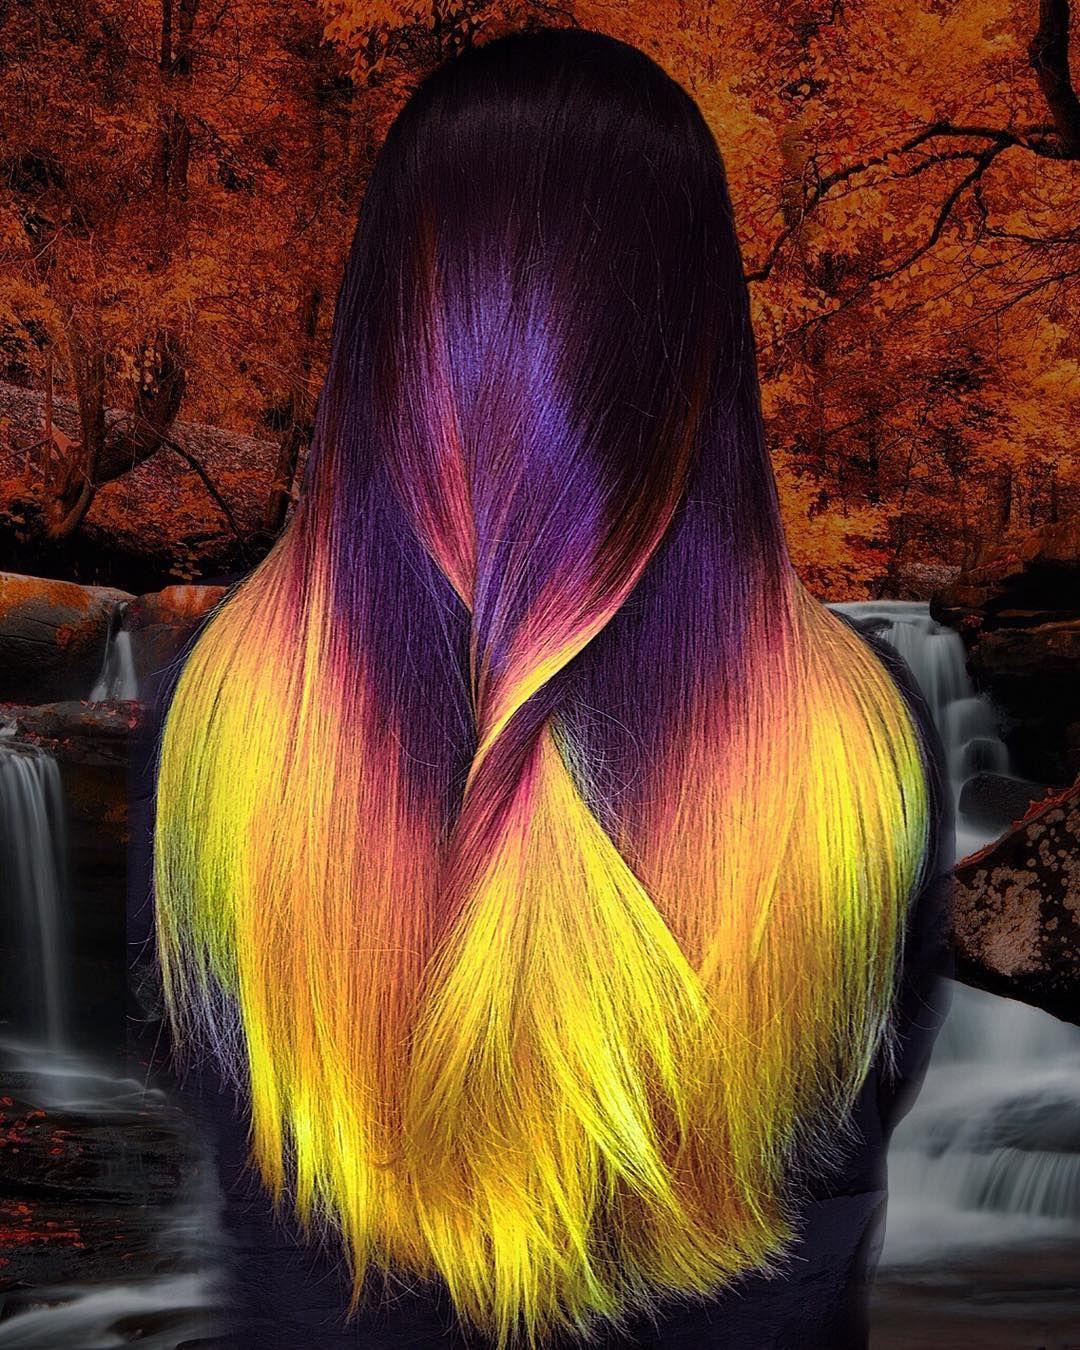 She S A Hallokween Halloween Halloweenhair Vividhair Haircolorideas Vividbalayage Fallhairco Yellow Hair Color Hair Styles Long Hair Styles